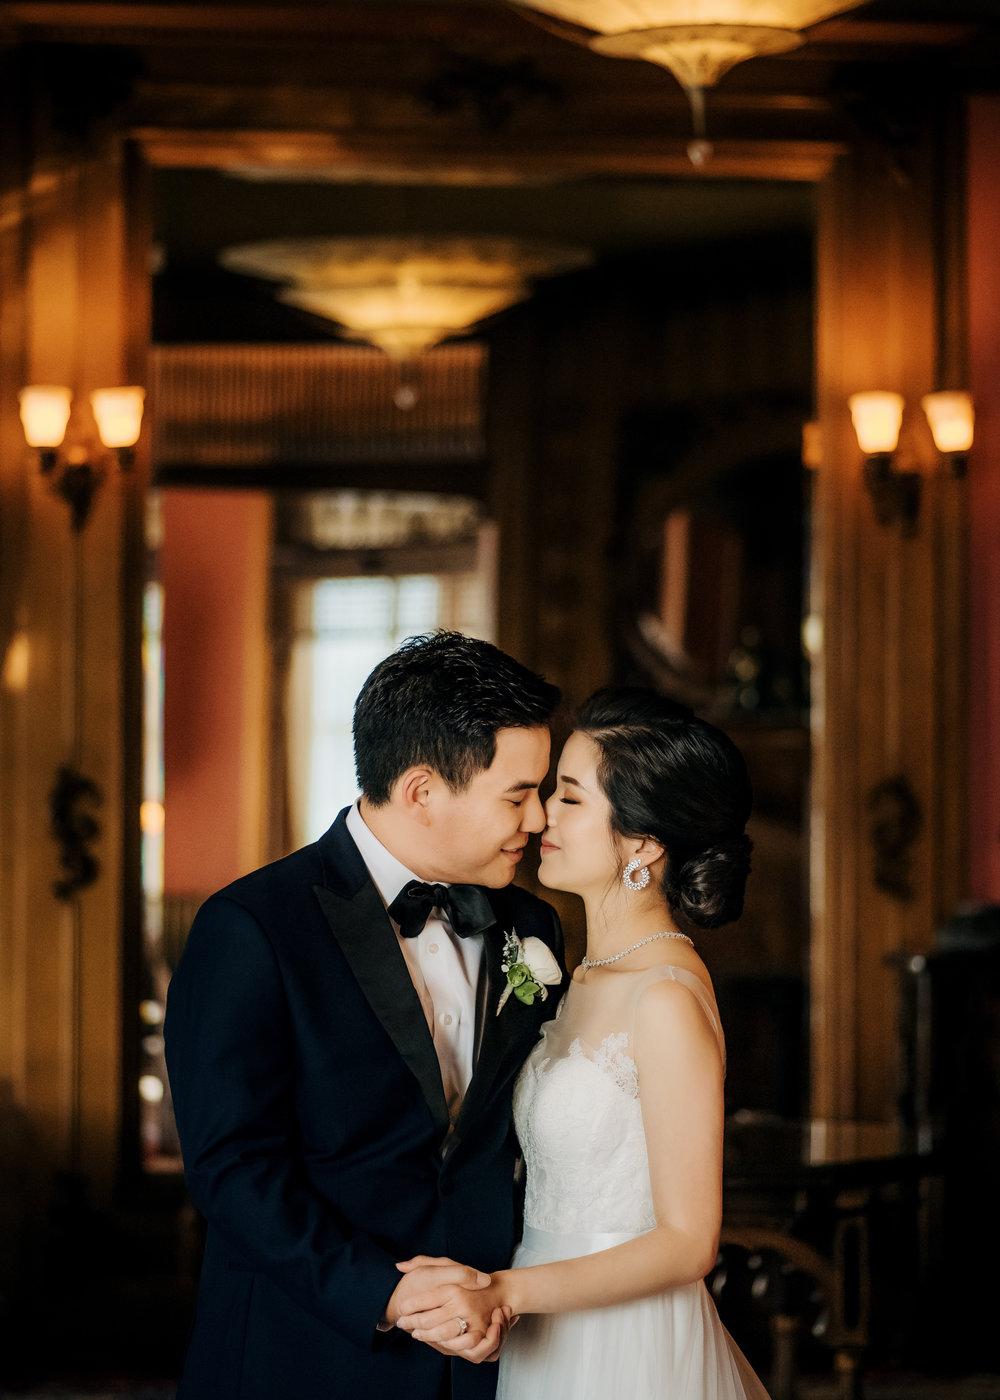 Turchin_20181014_Prim-Jacky-Wedding_136.jpg